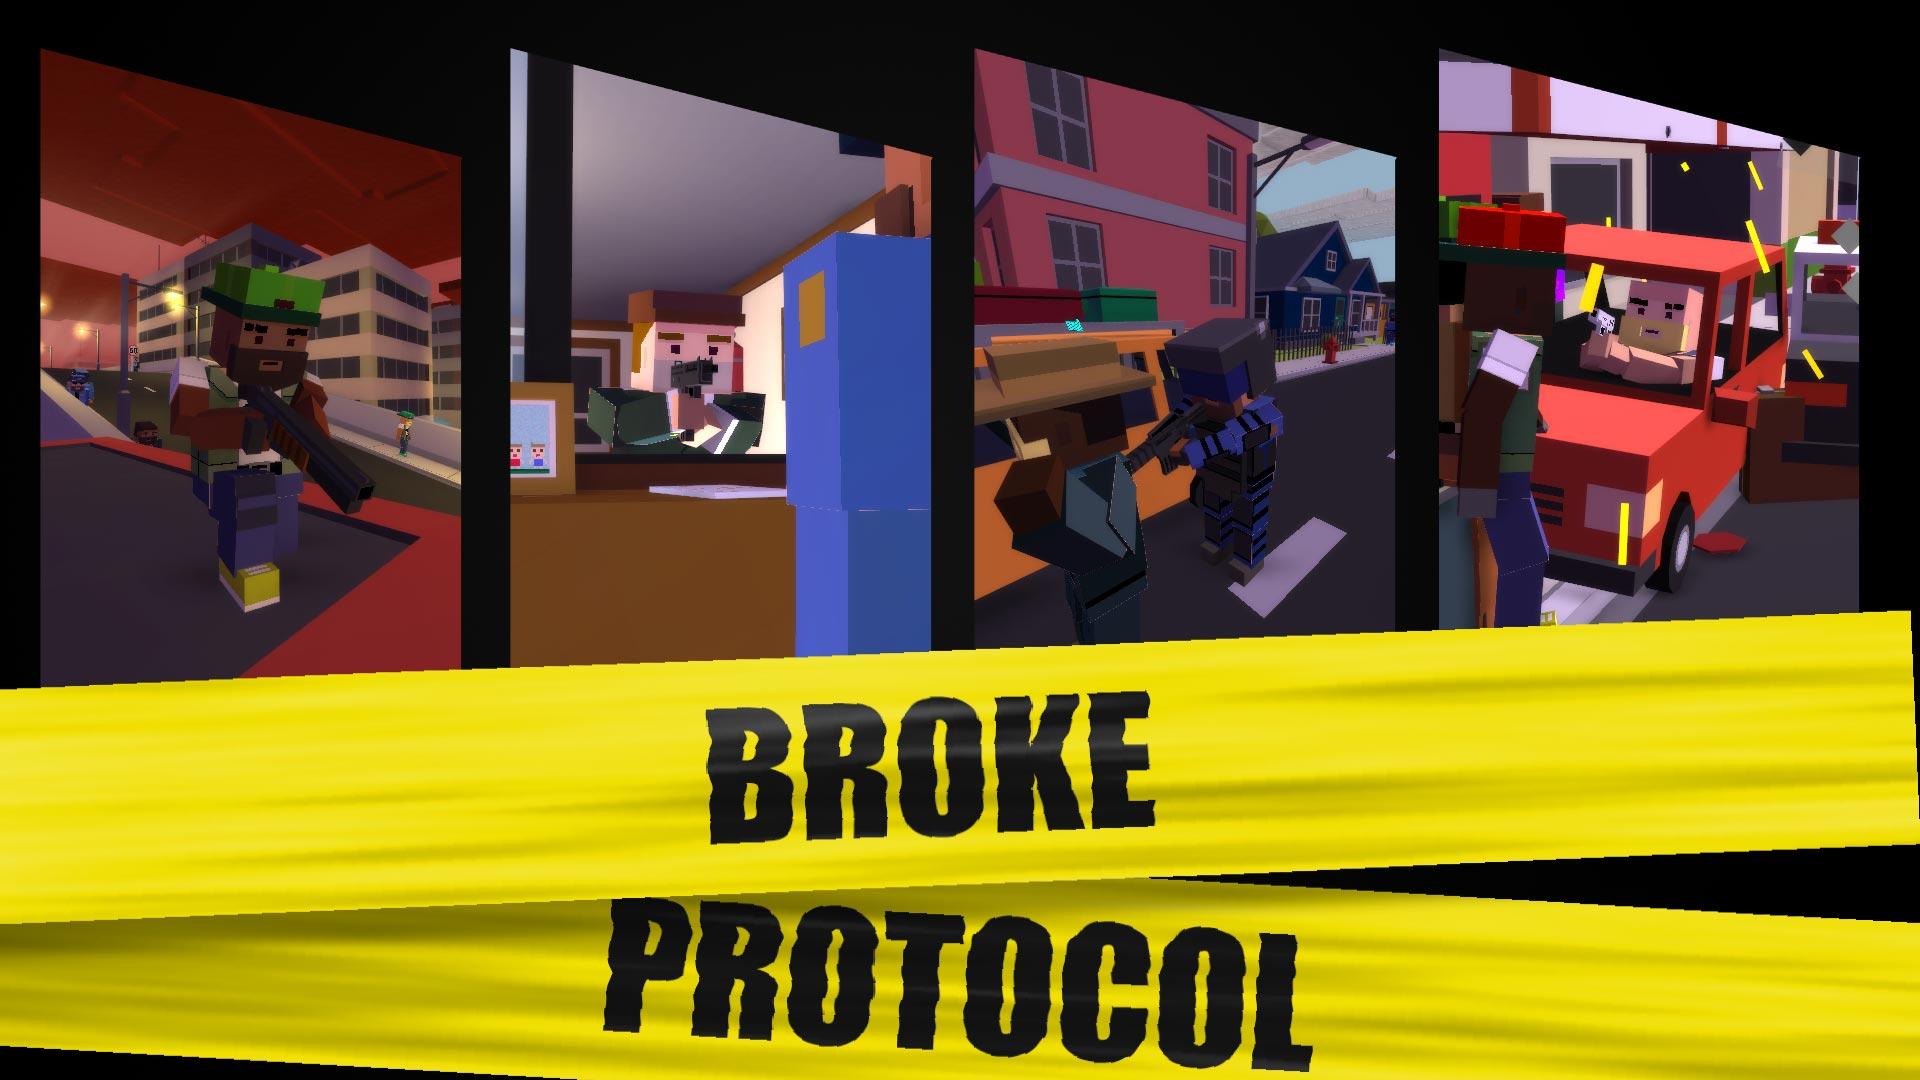 brokeprotocol